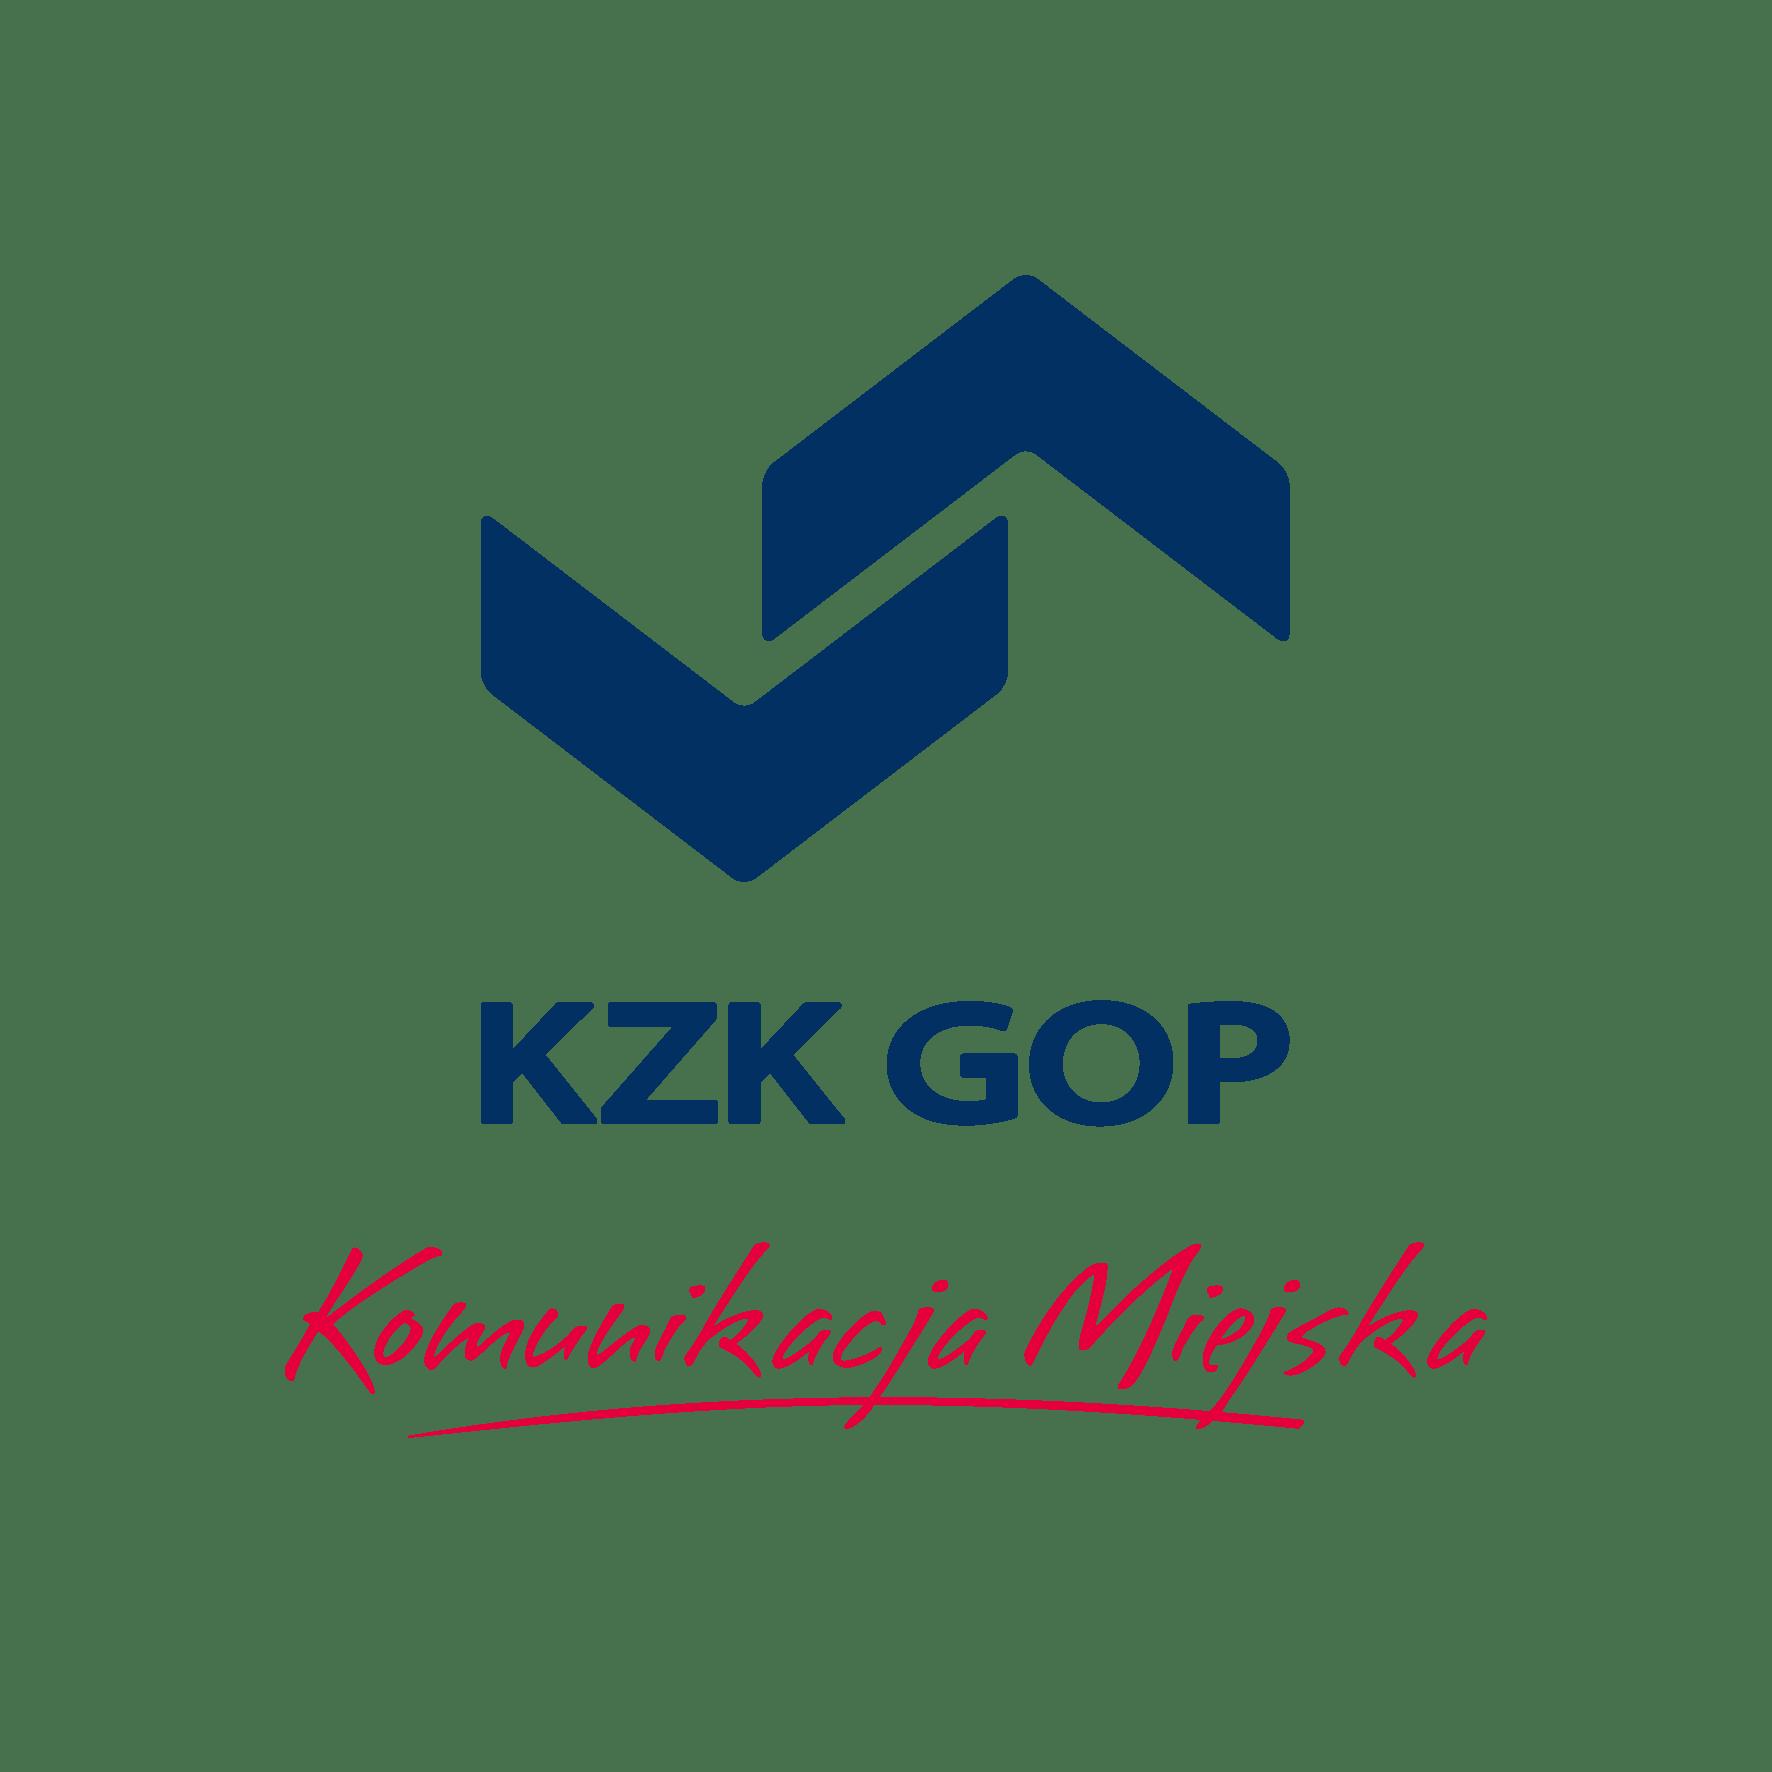 kzk gop logo